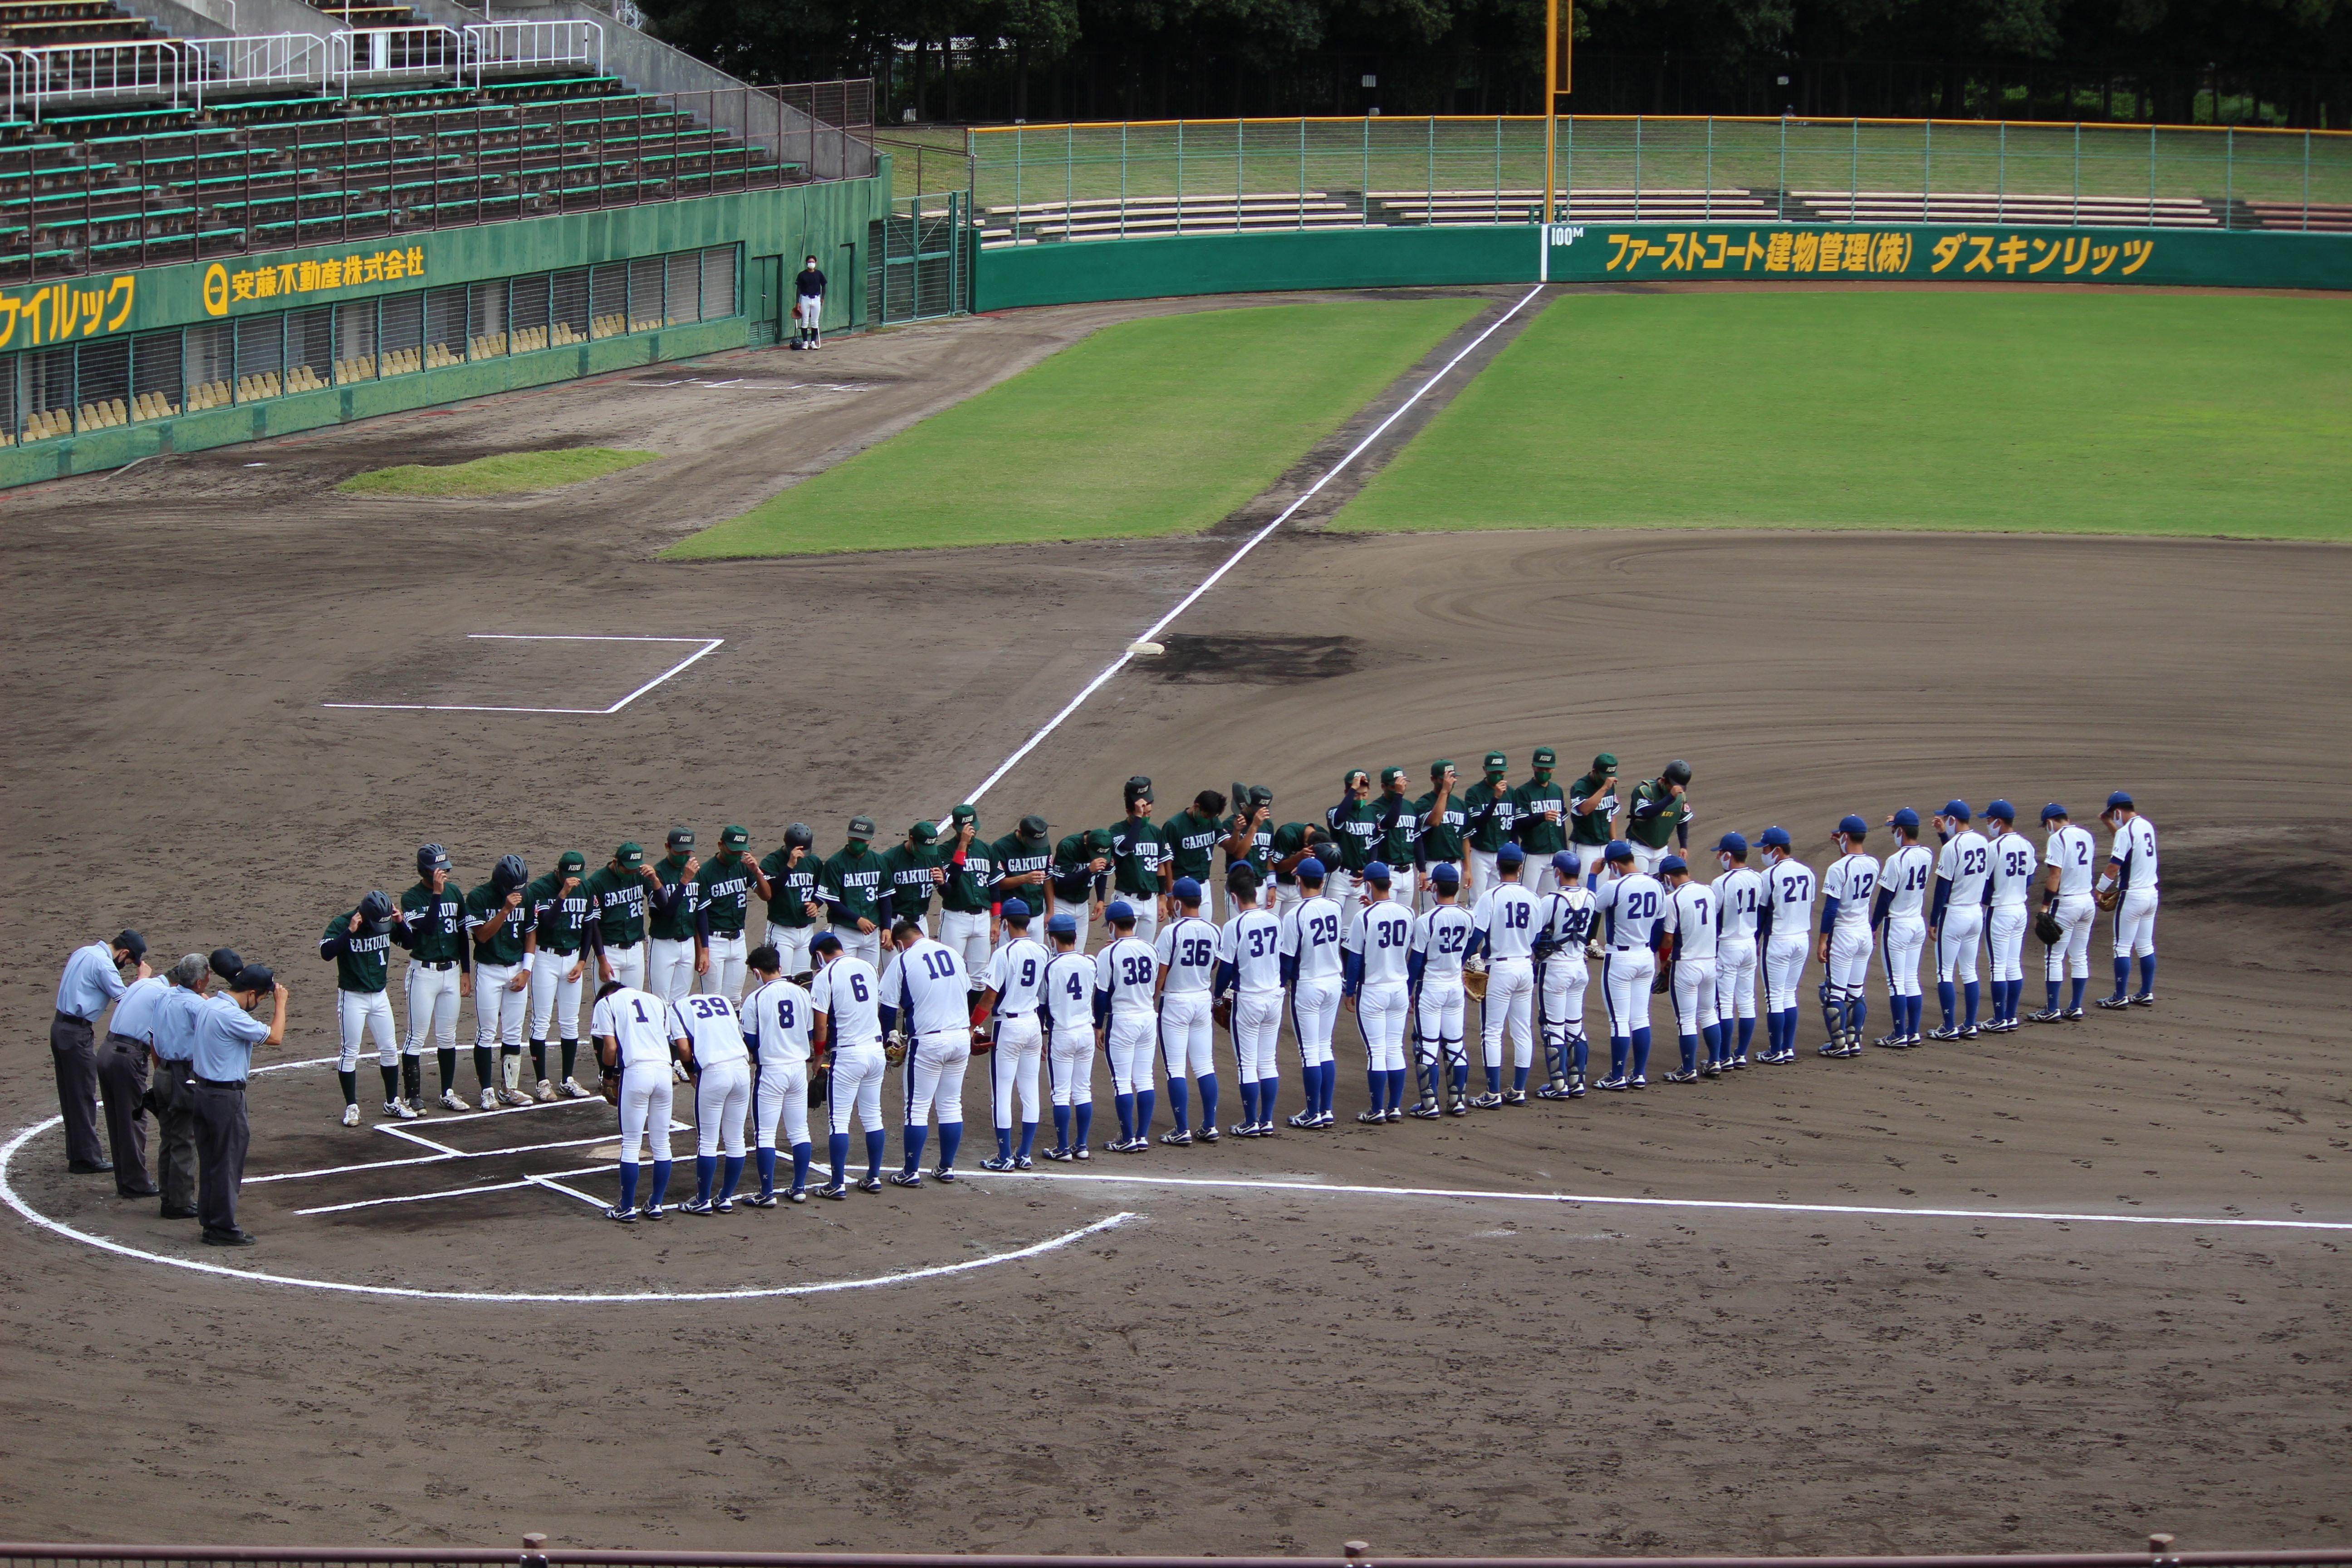 baseball_2021_A_1.JPG